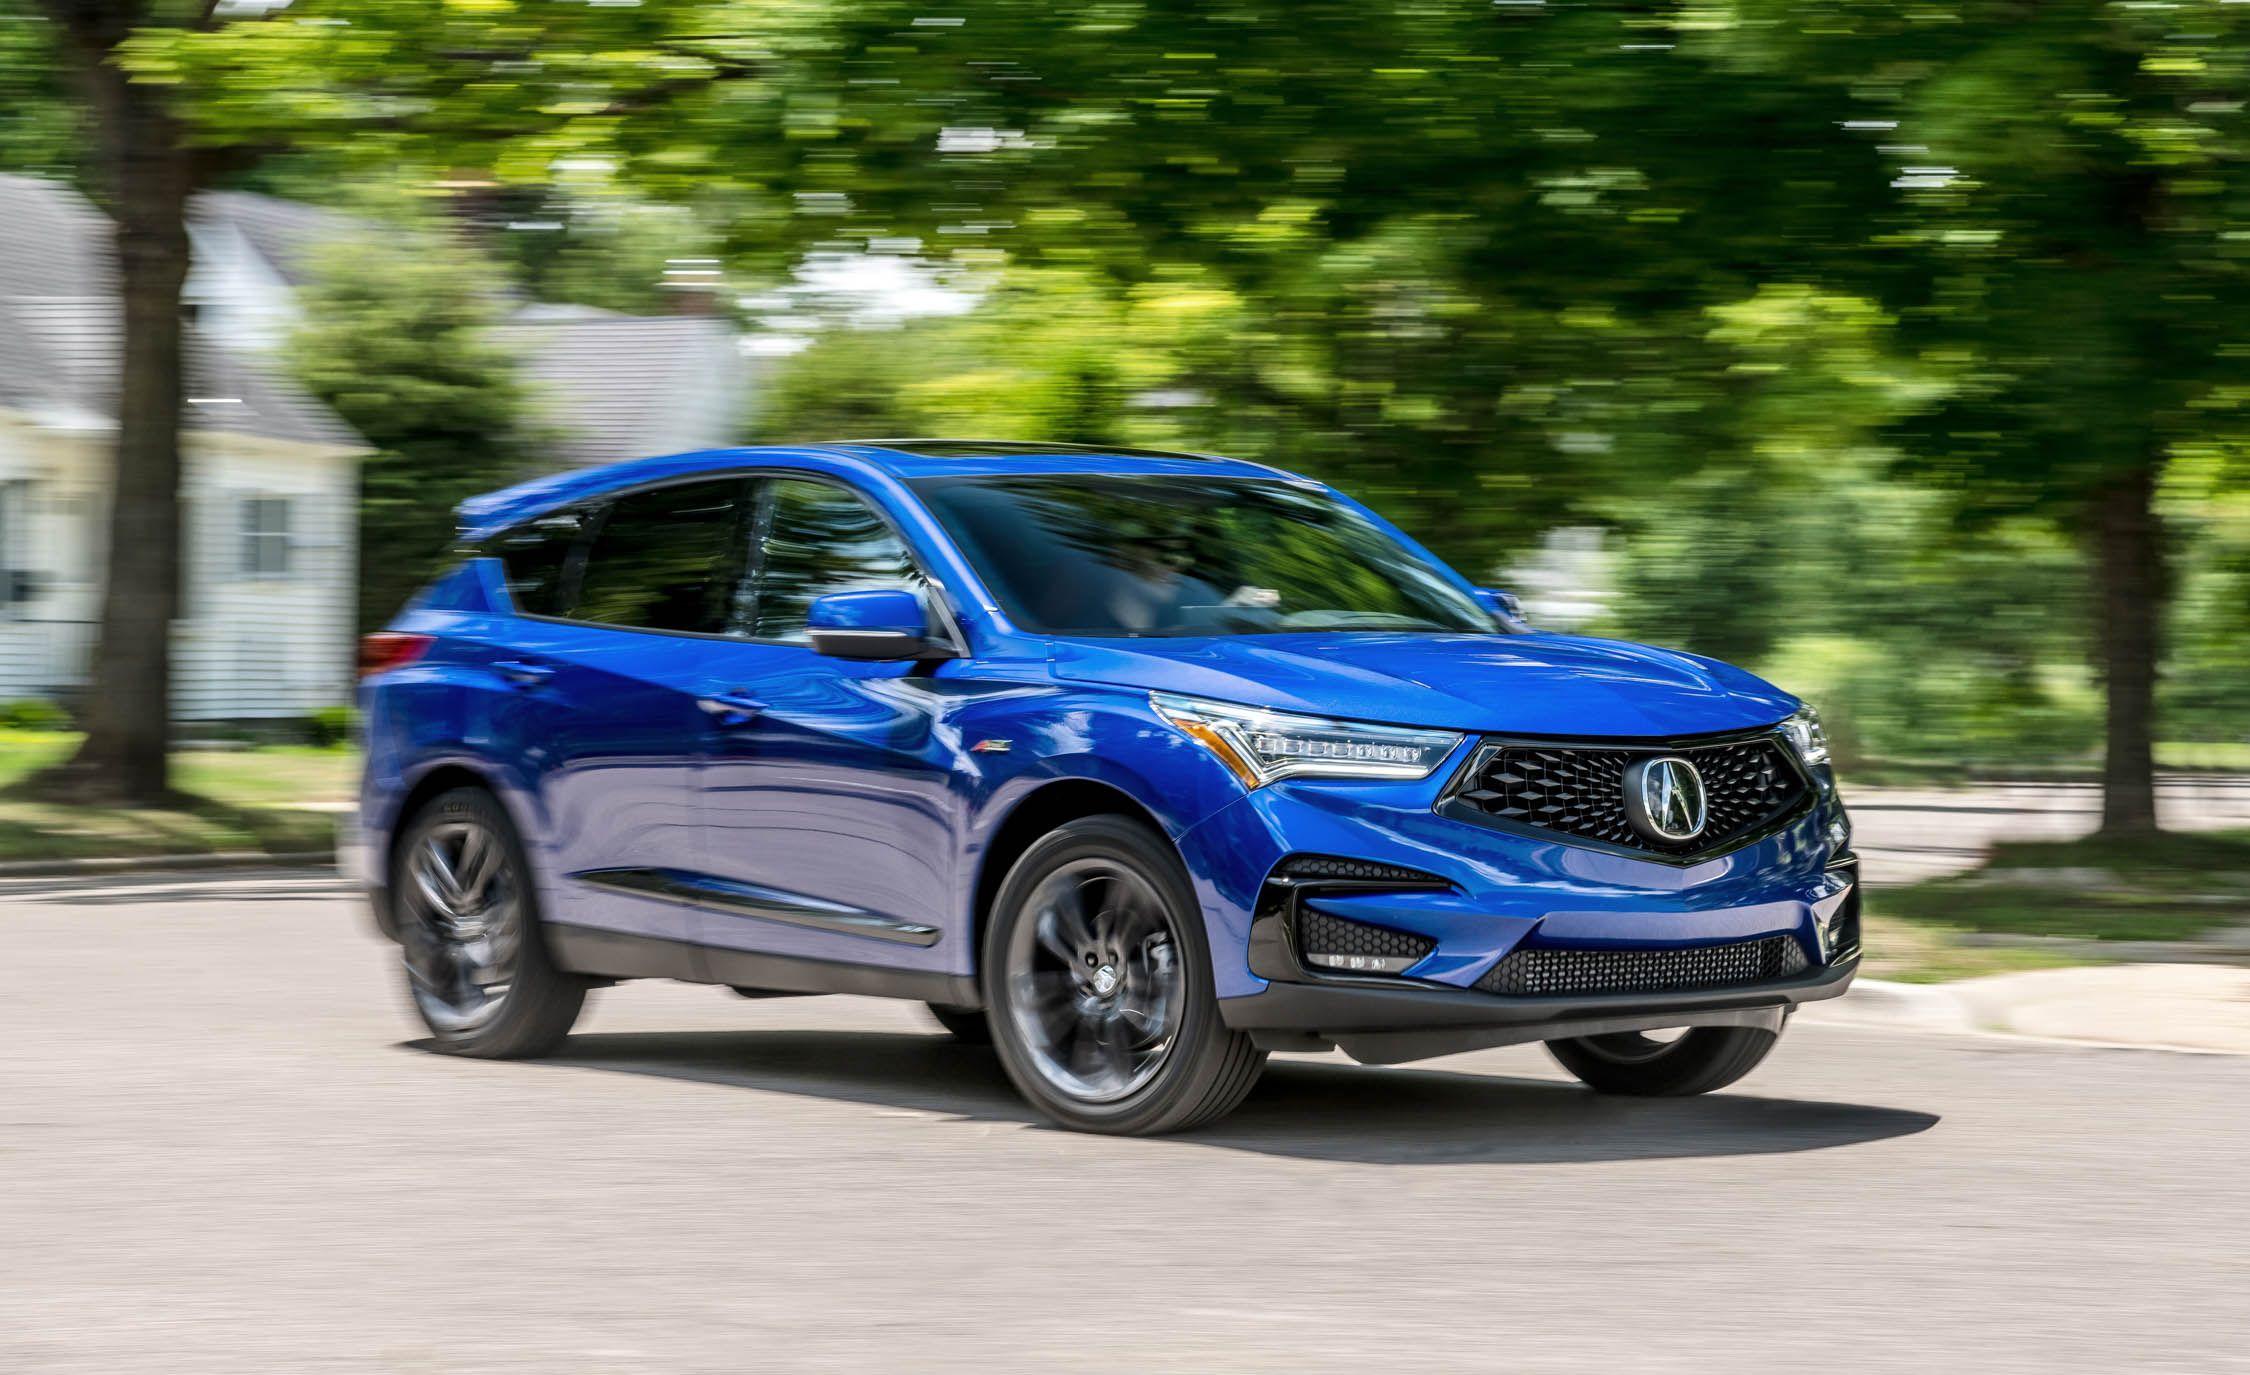 Acura RDX Reviews Acura RDX Price Photos And Specs Car And Driver - Acura rdx 2018 price